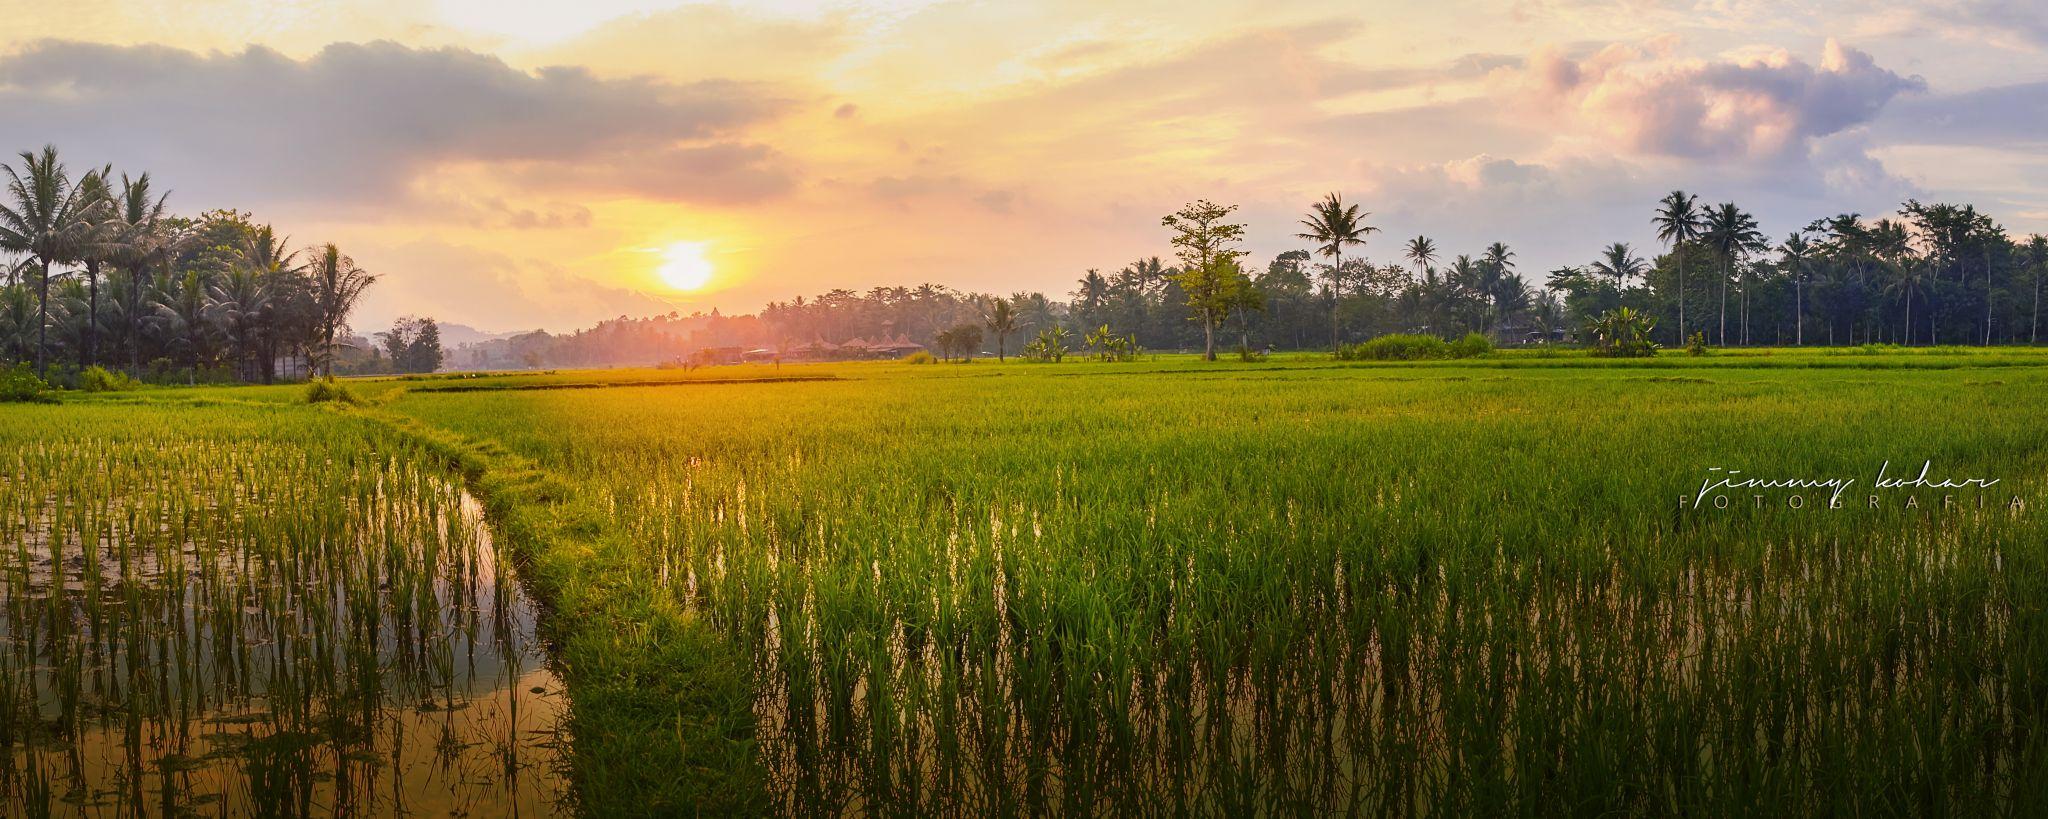 Paddy Field near Borobudur Temple, Indonesia